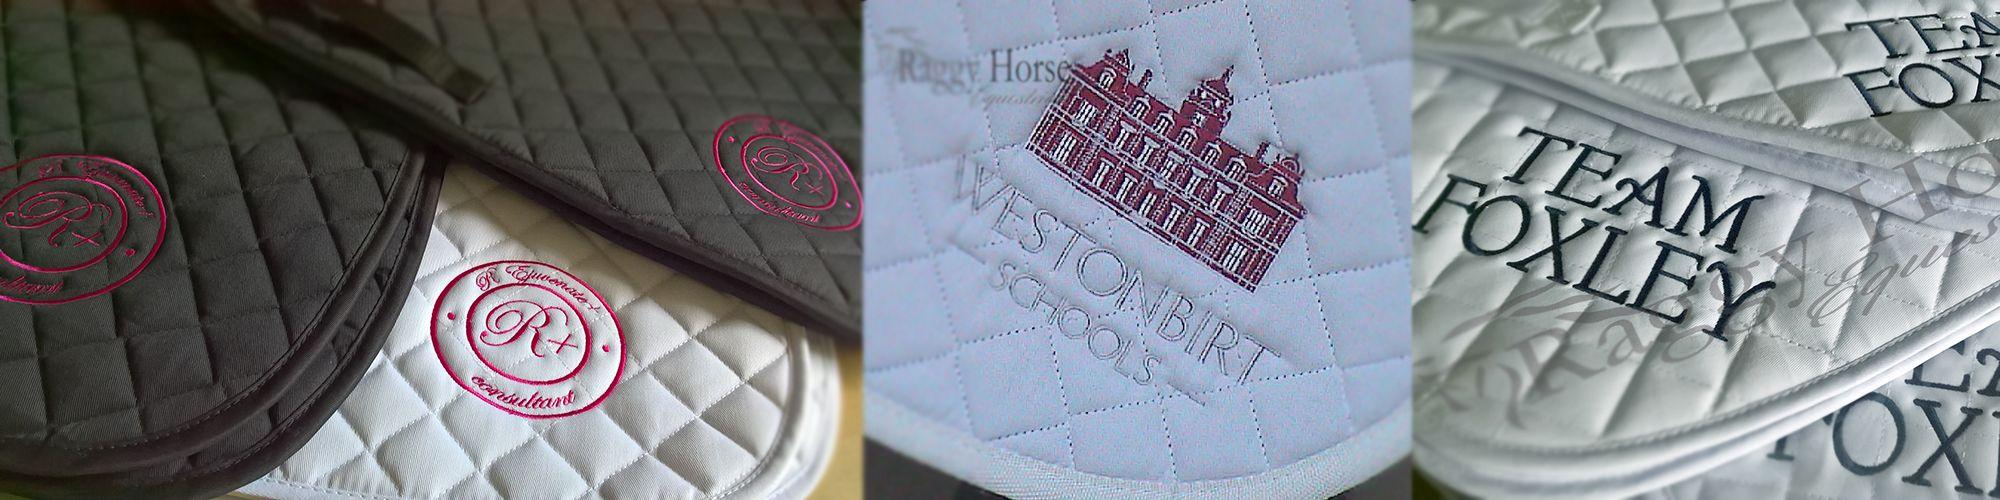 Raggy Horse Bespoke/Team Embroidery